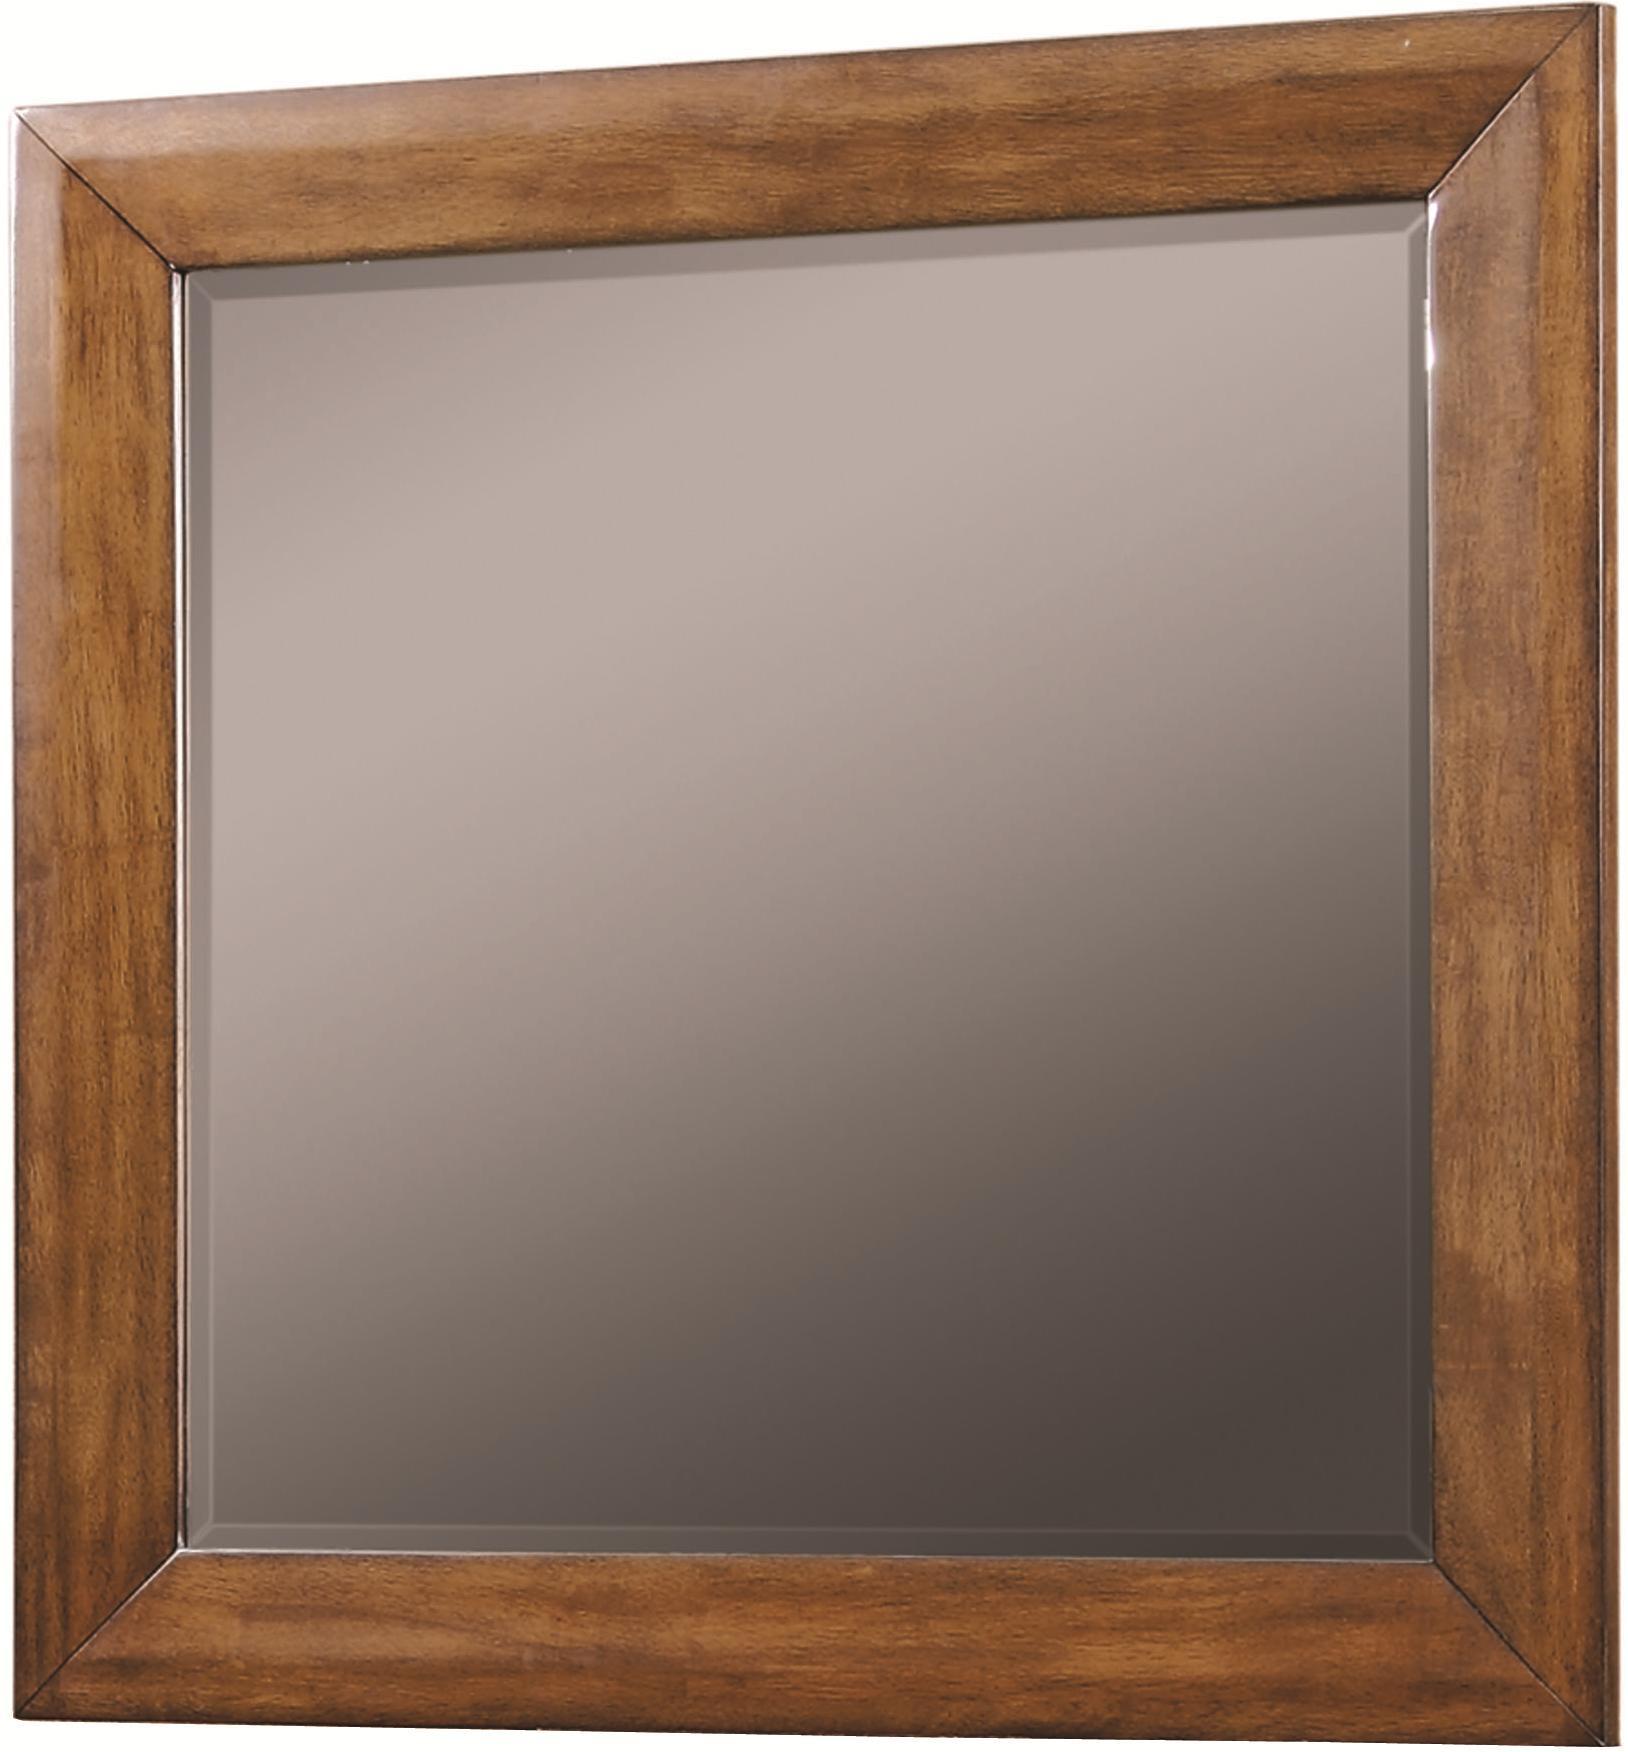 Tamarind Landscape Mirror by Aspenhome at Stoney Creek Furniture